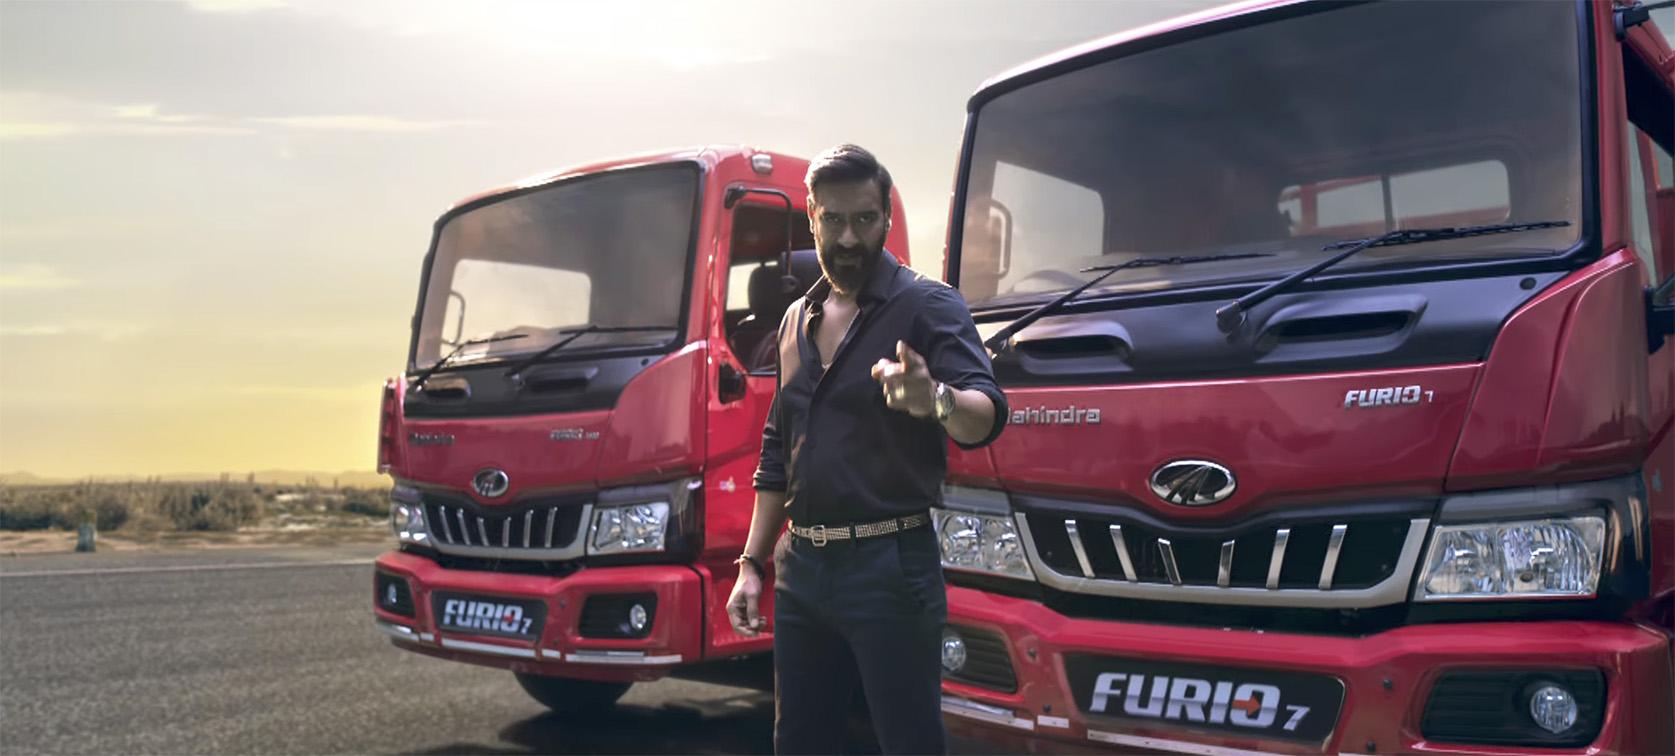 Ajay Devgn re-enacts iconic stunt to launch new Mahindra FURIO 7 range via FCB Interface India